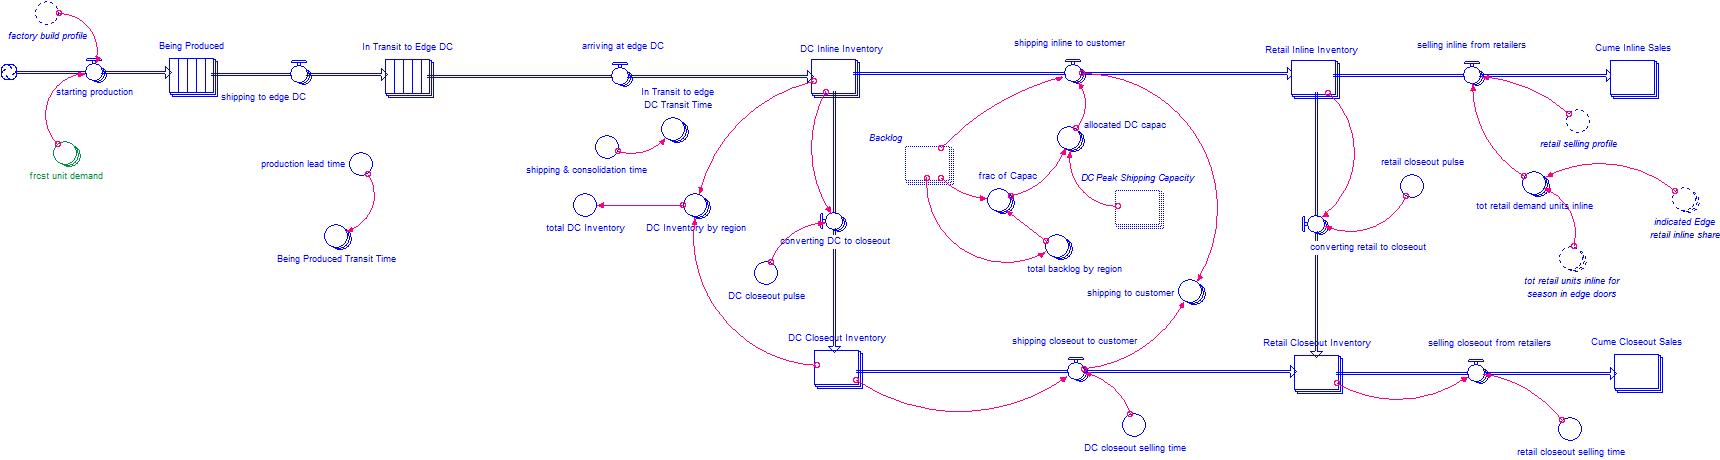 Portion of edge Inc. supply chain model